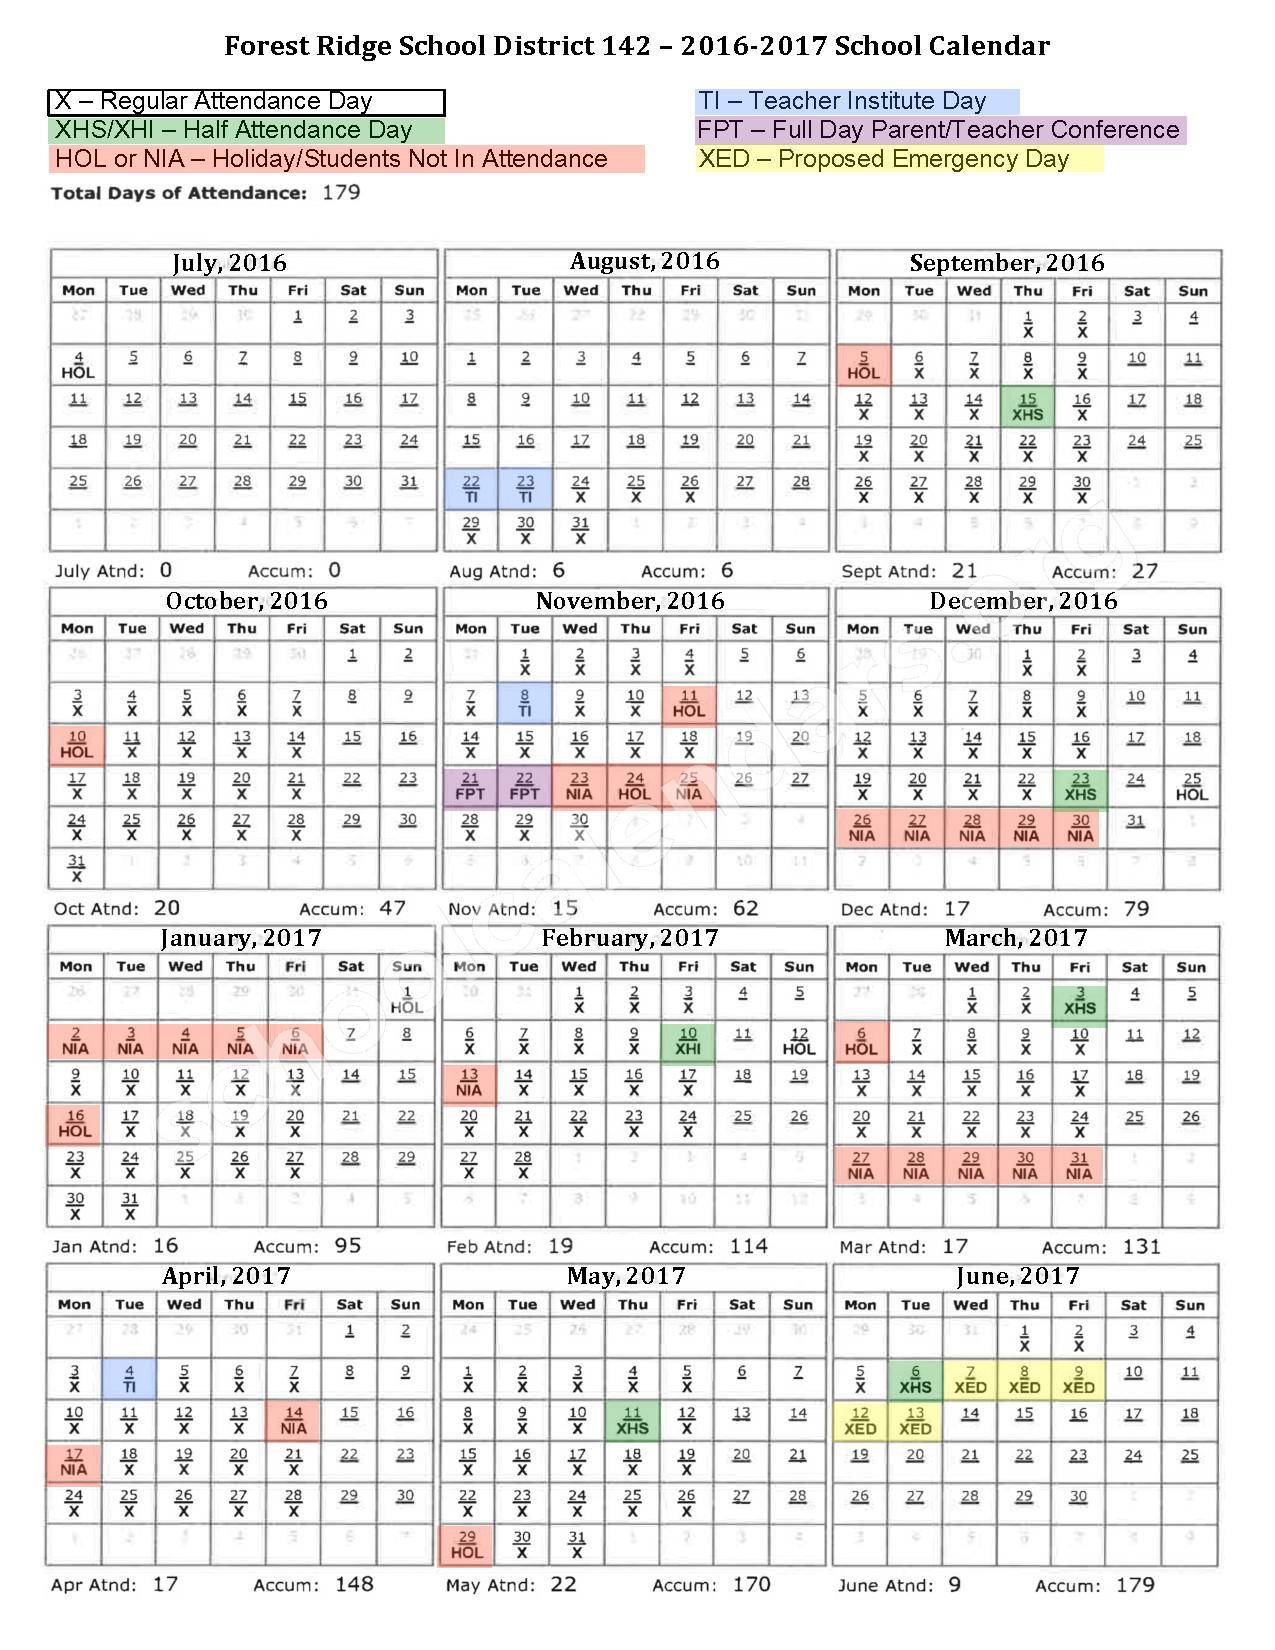 2016 - 2017 School Calendar – Kerkstra Elementary School – page 1